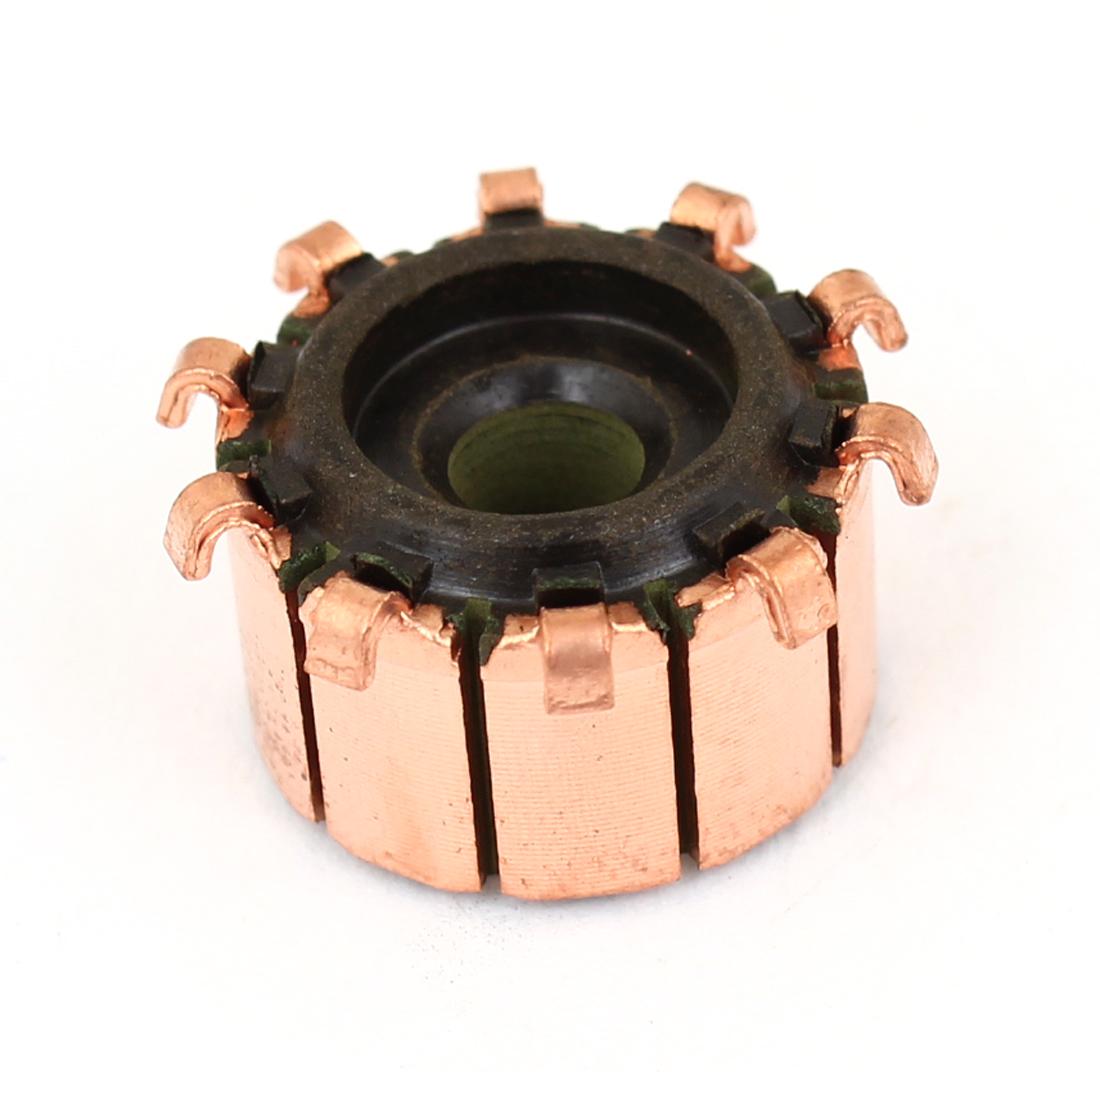 C002D 4.5mmx15mmx10mm Copper Case Auto Alternator Motor Power Tool Commutator